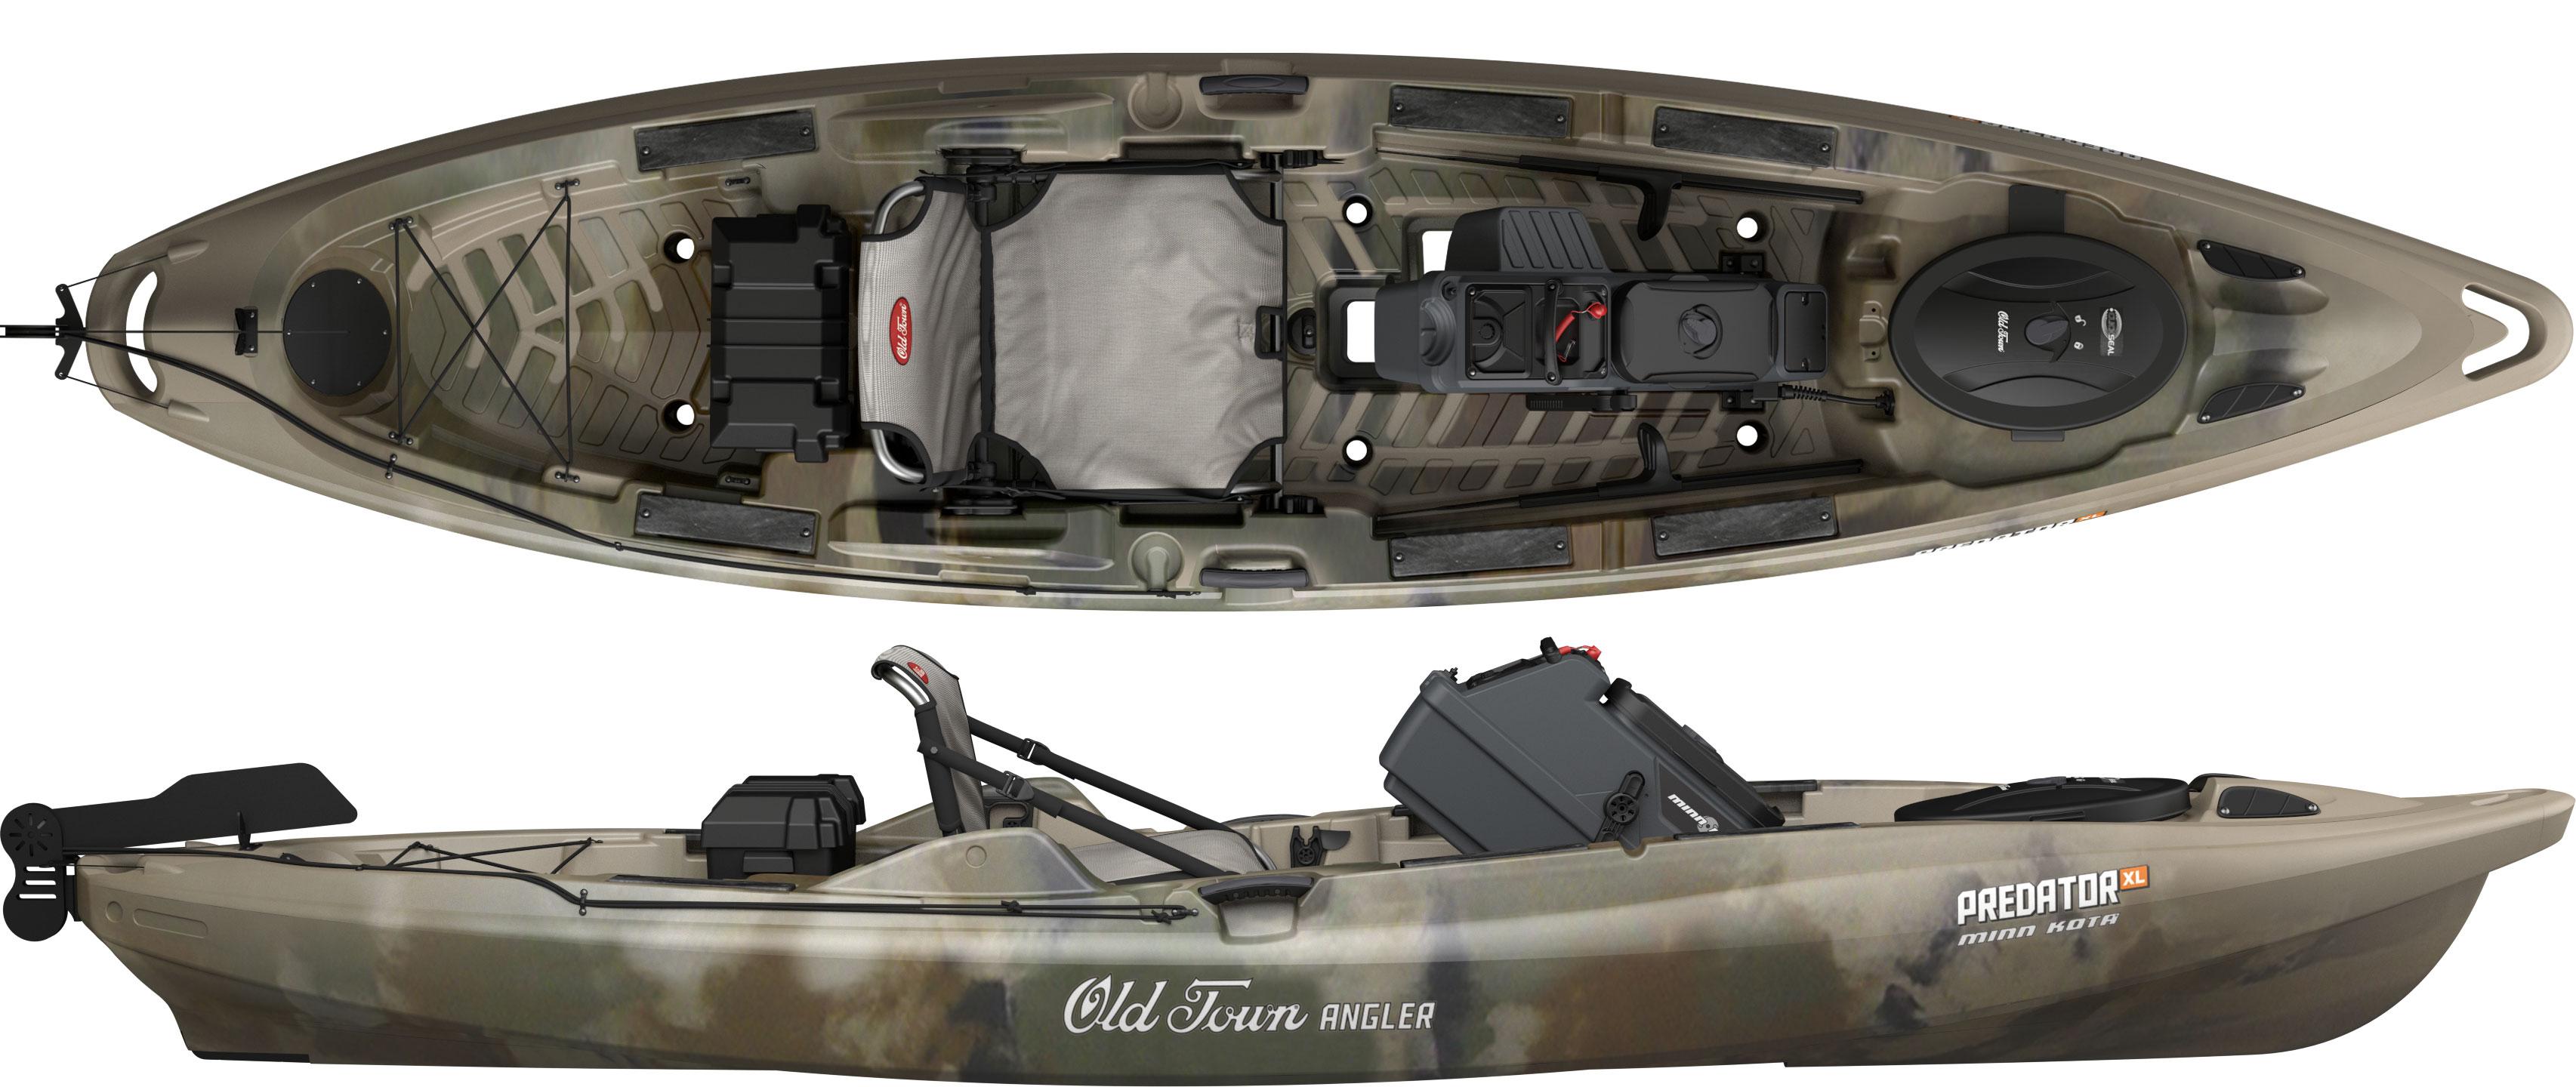 Old Town Predator XL Minn Kota kayak